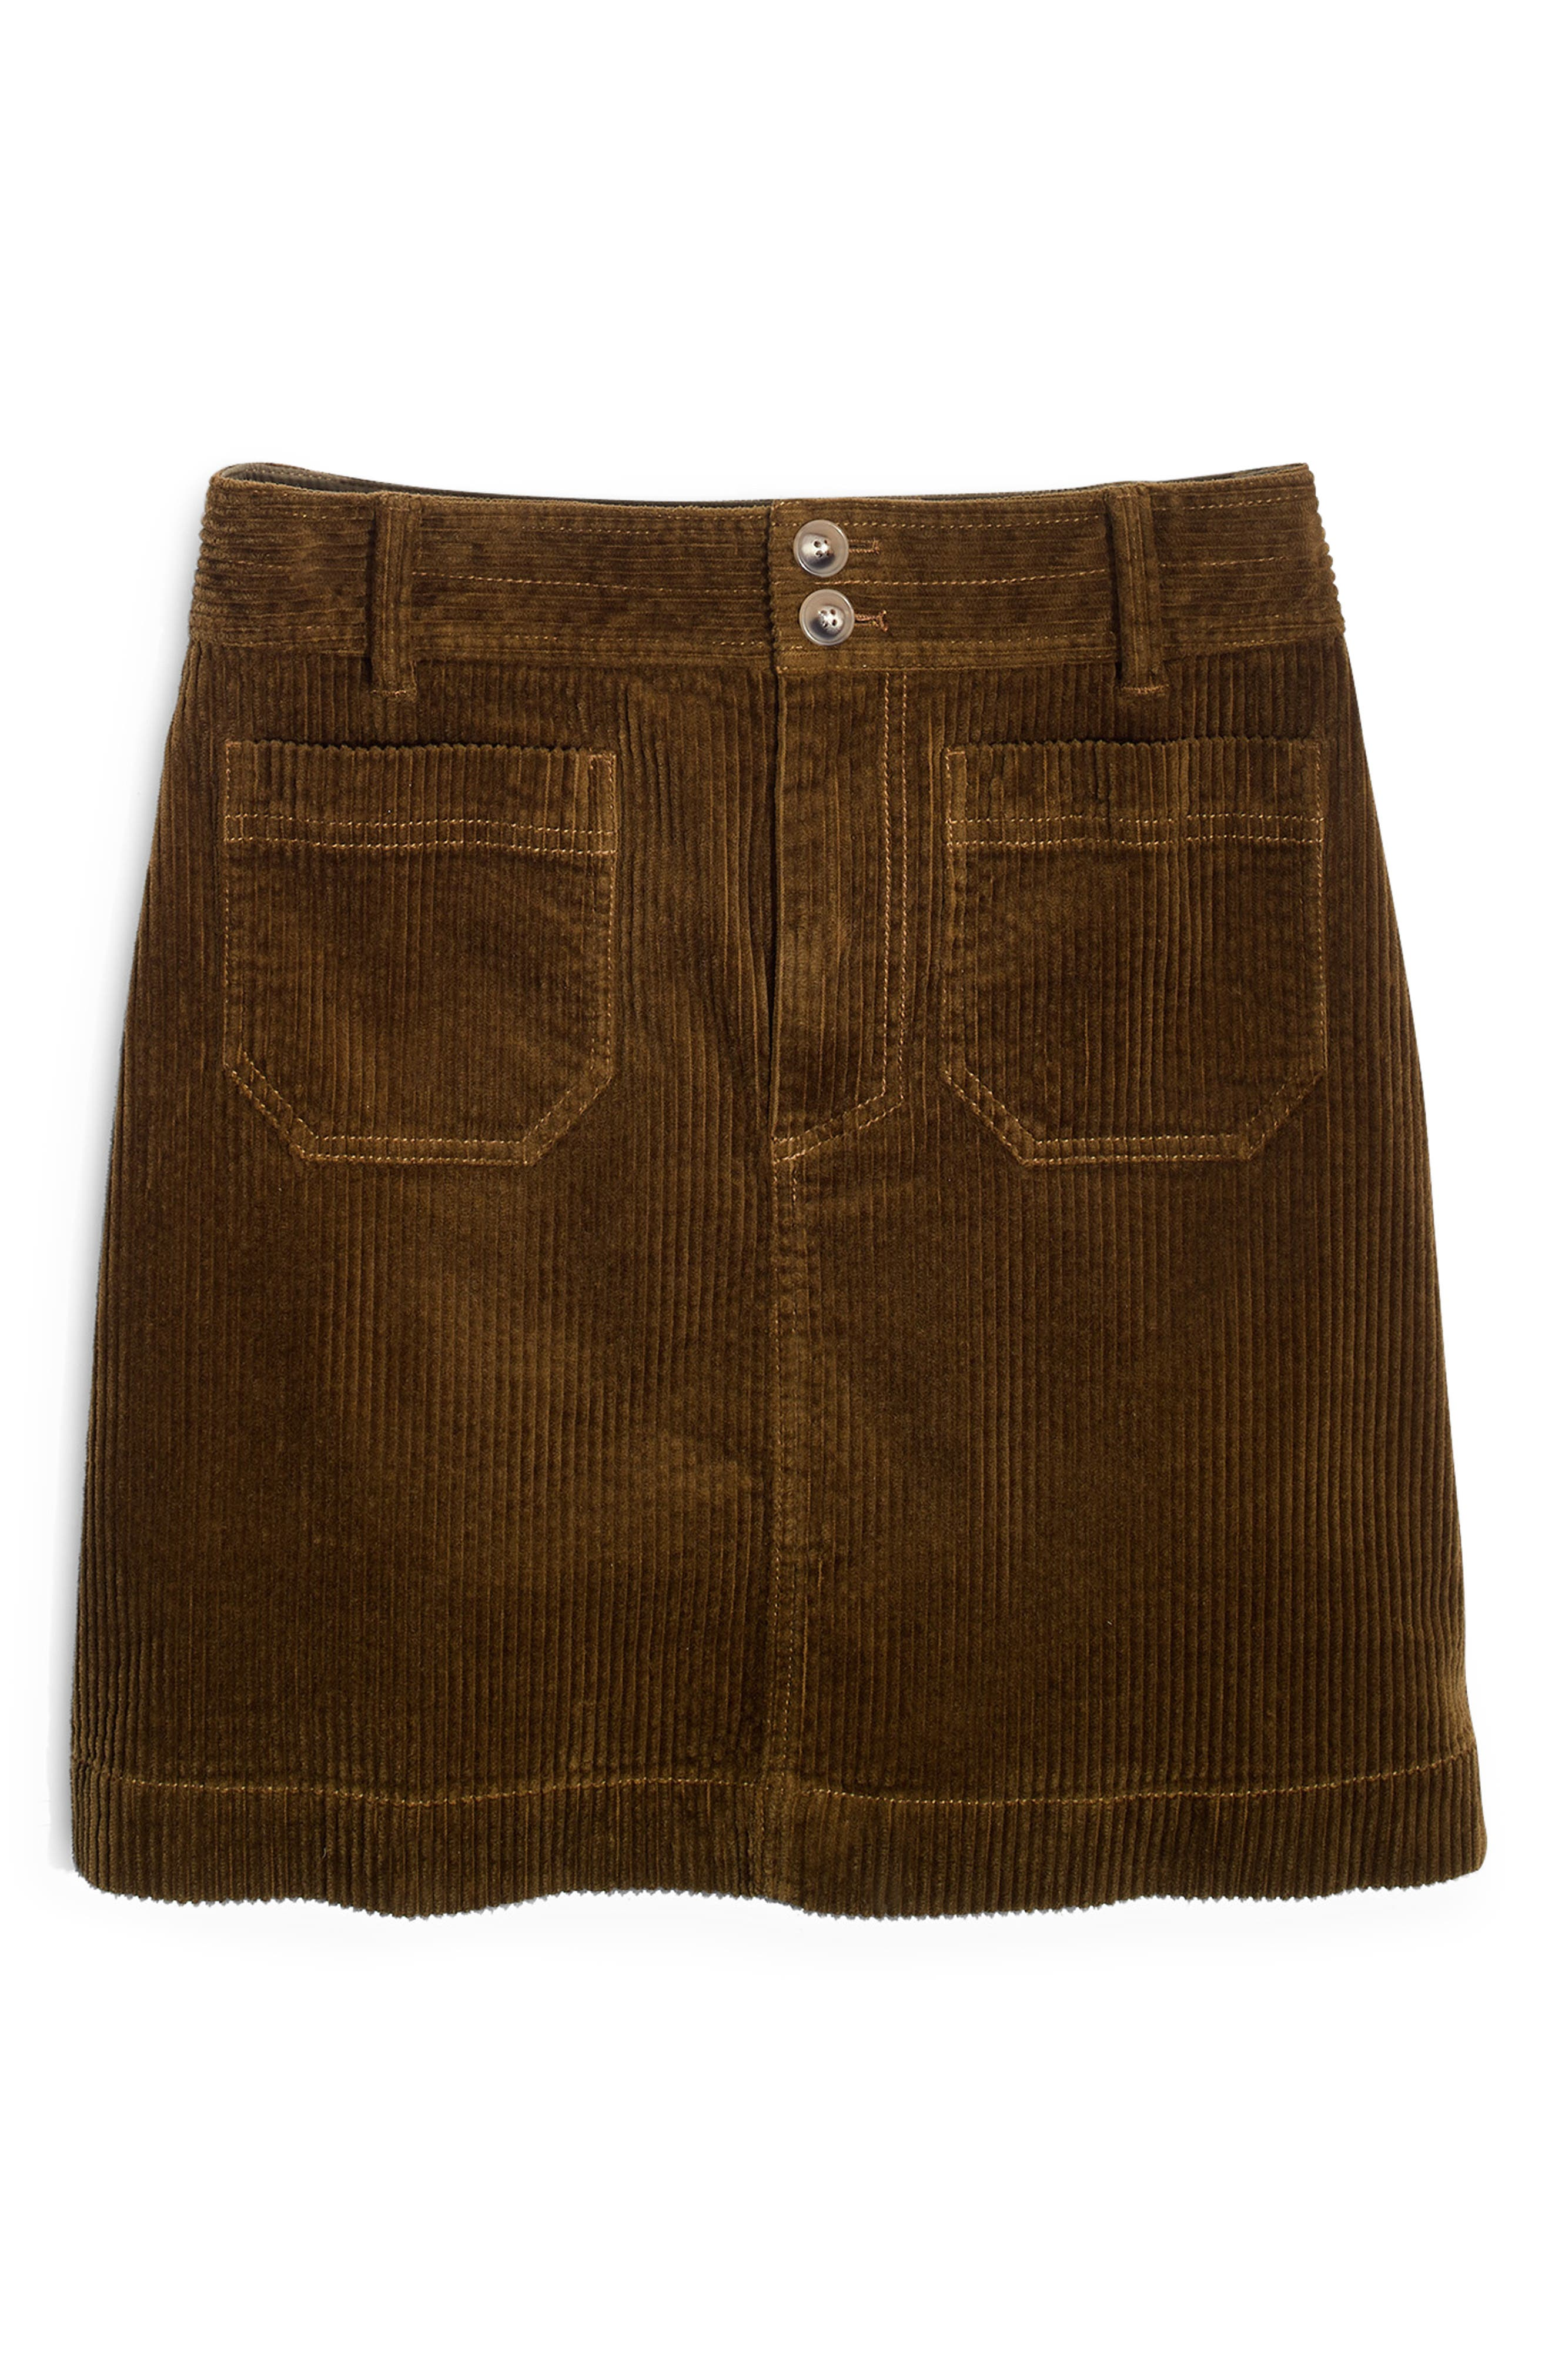 Corduroy A-Line Miniskirt,                             Alternate thumbnail 4, color,                             ASPARAGUS